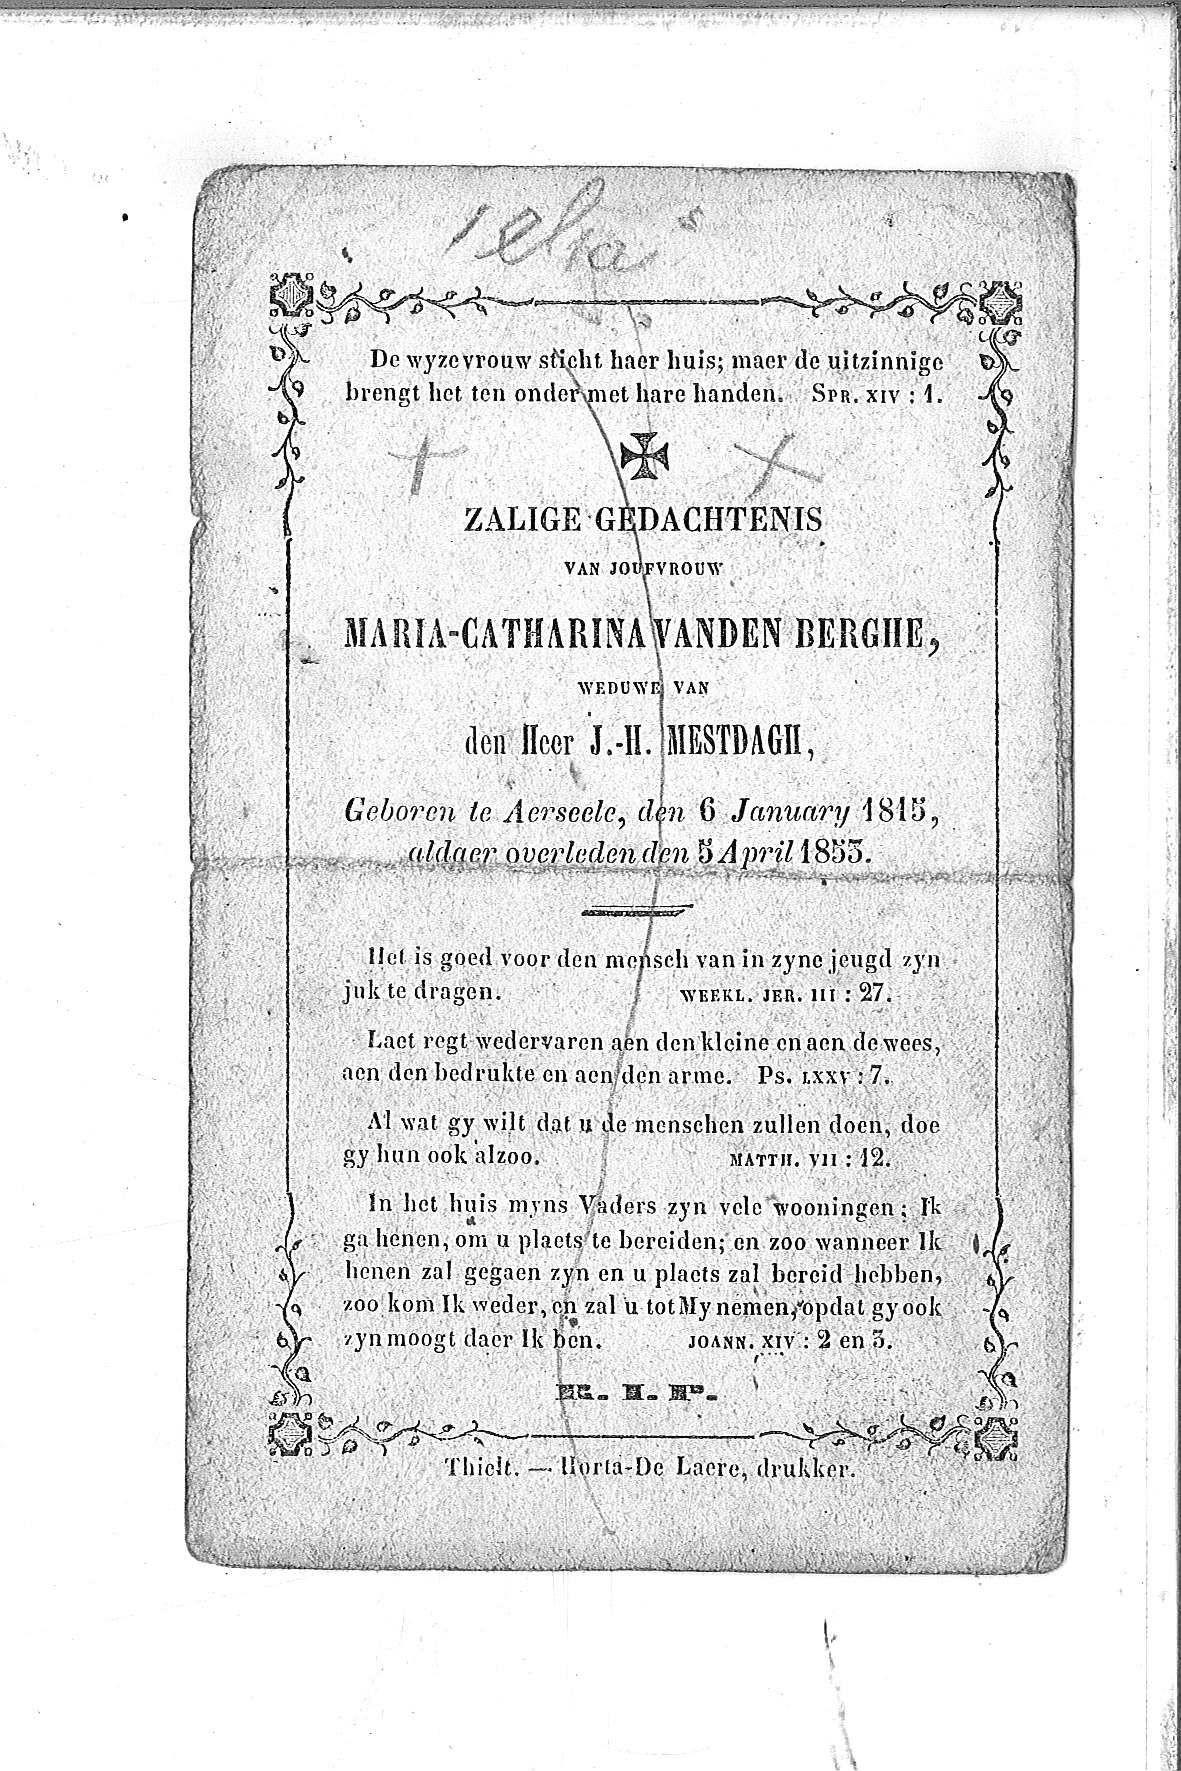 Maria-Catharina(1853)20140717143324_00005.jpg